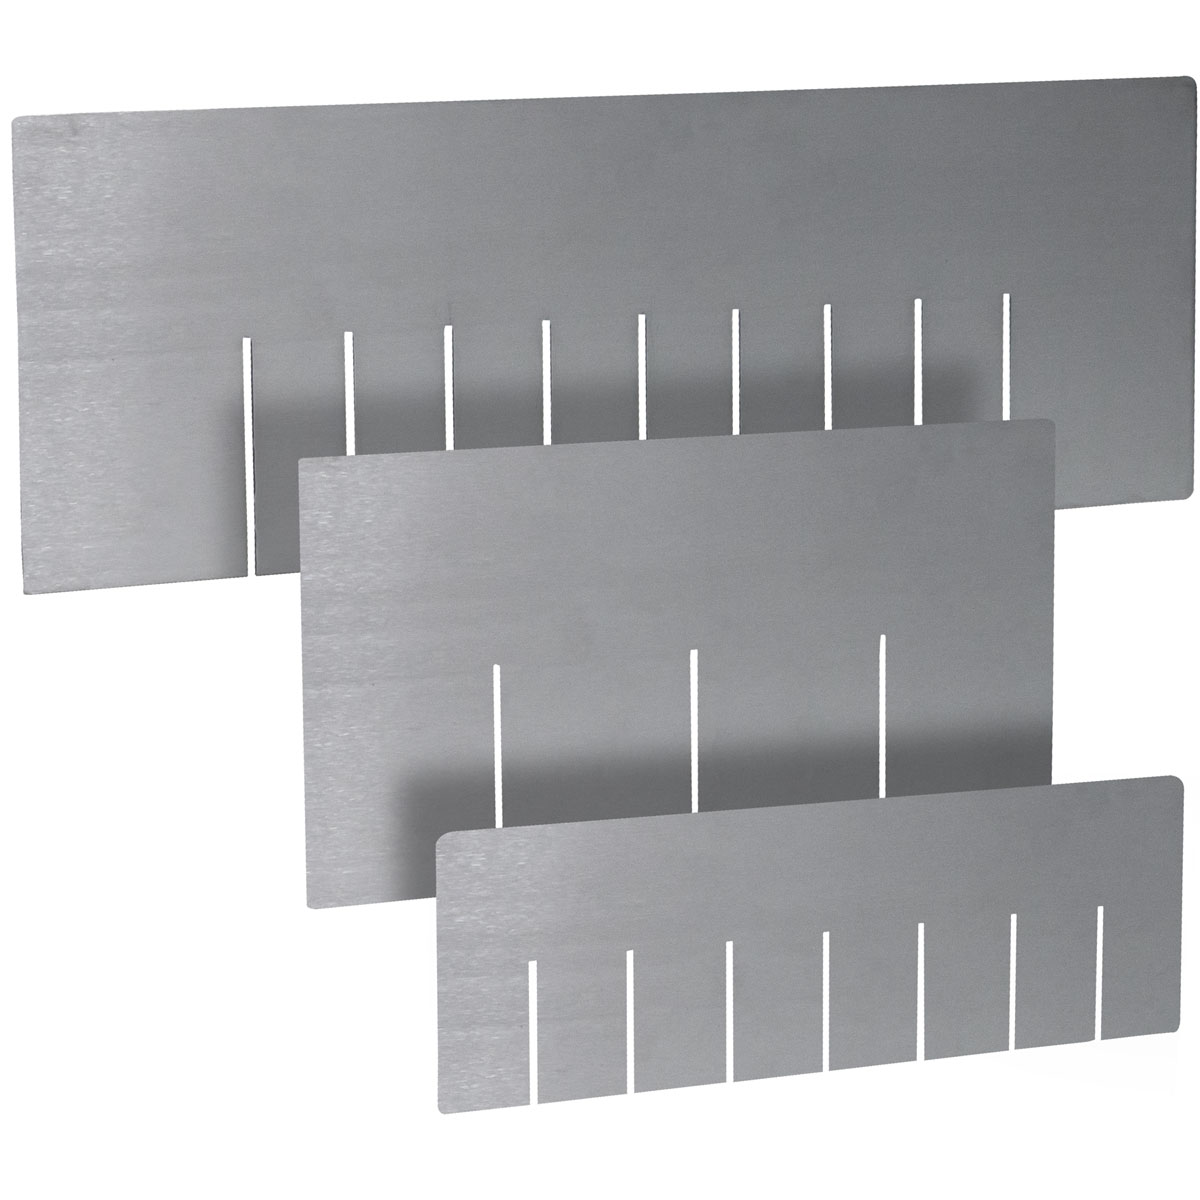 "Long Aluminum Divider20.65"" x 3.63""SKU: 521029"